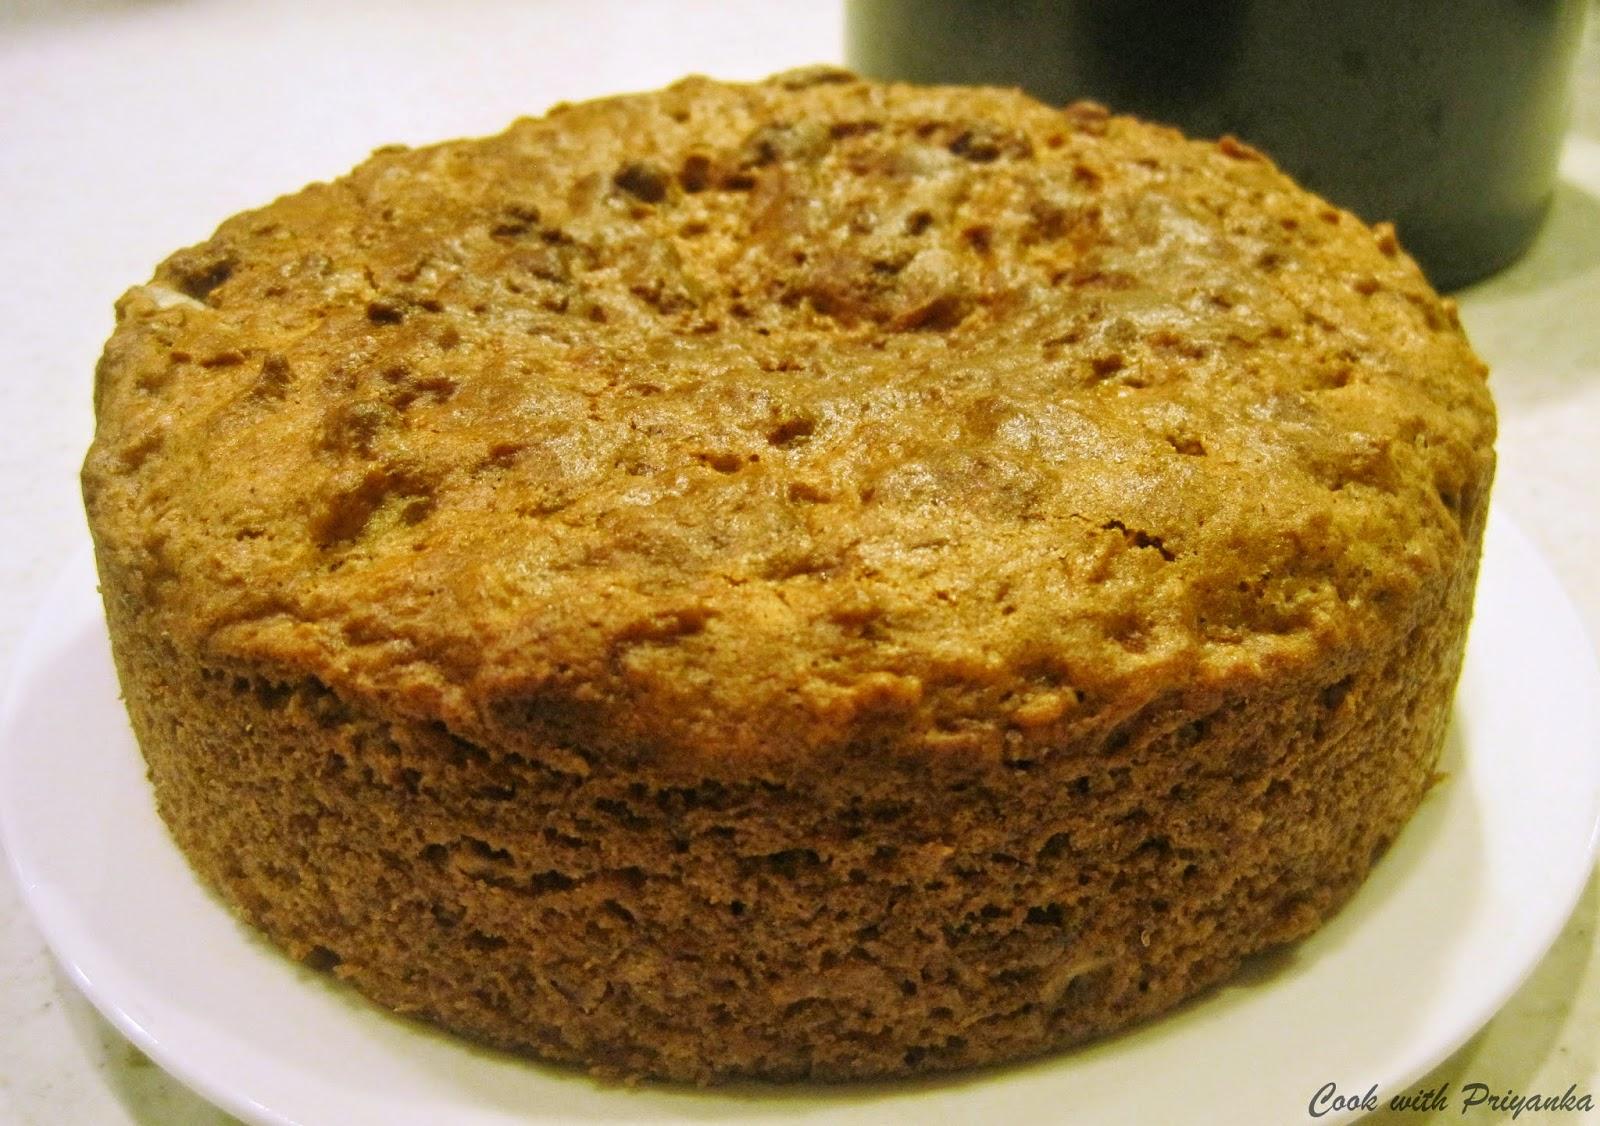 http://cookwithpriyankavarma.blogspot.co.uk/2014/04/eggless-spiced-apple-cake.html